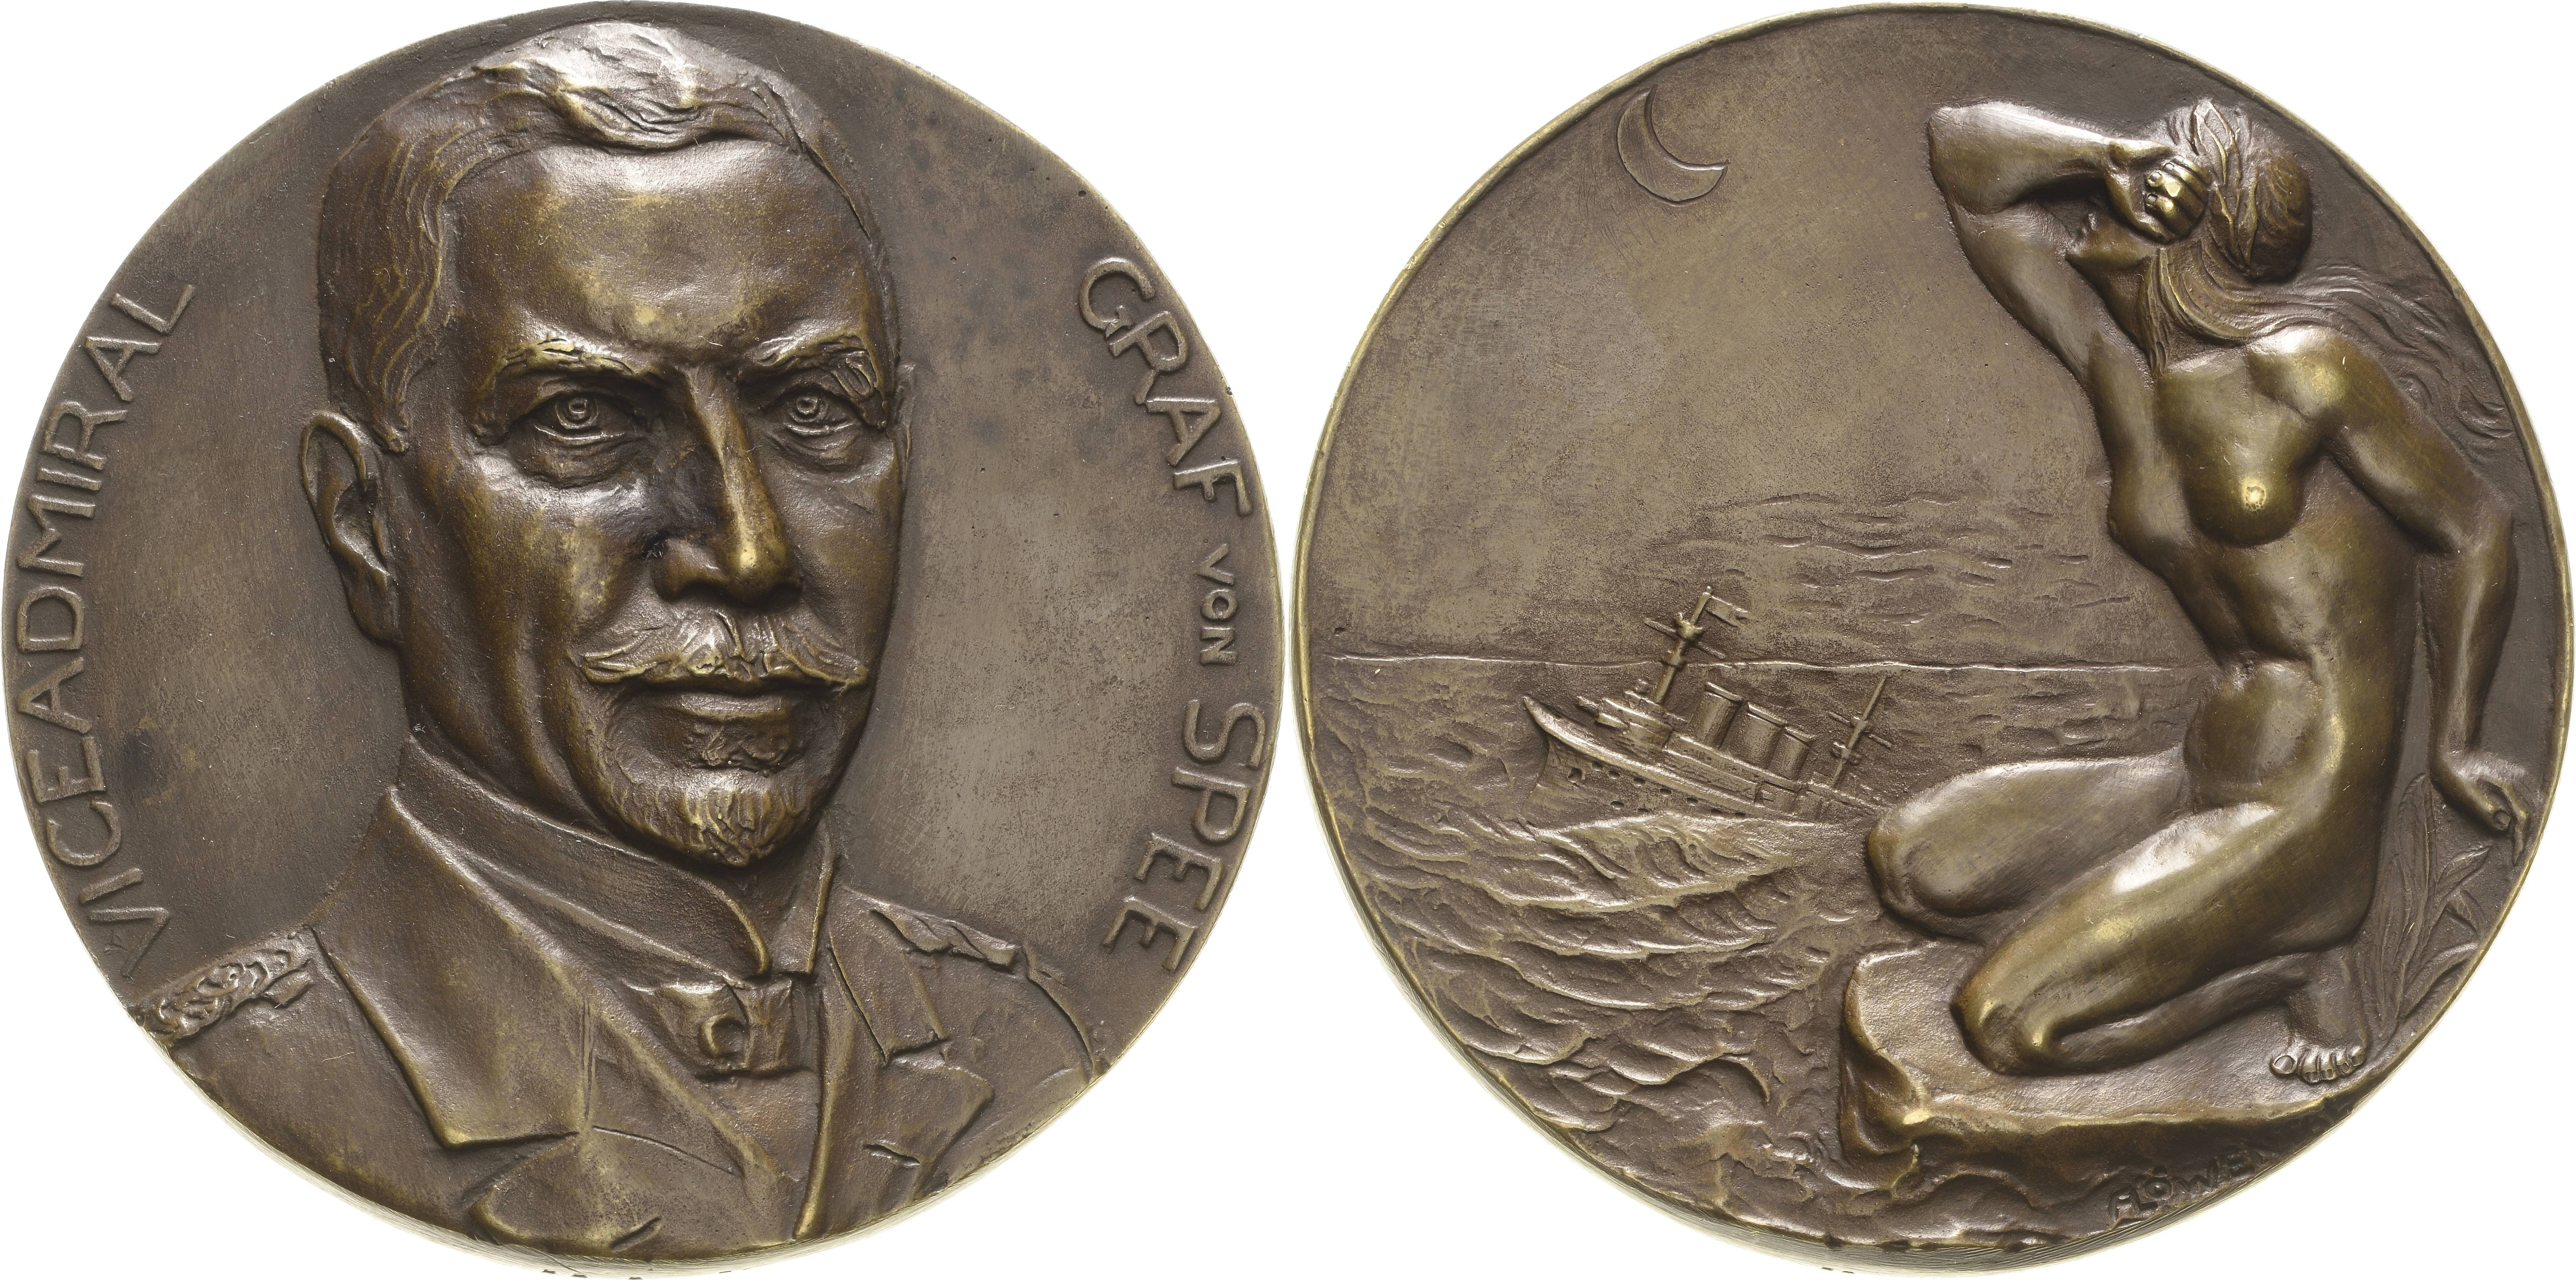 Falkland Islands Coin 1 Pound 1987 UNC